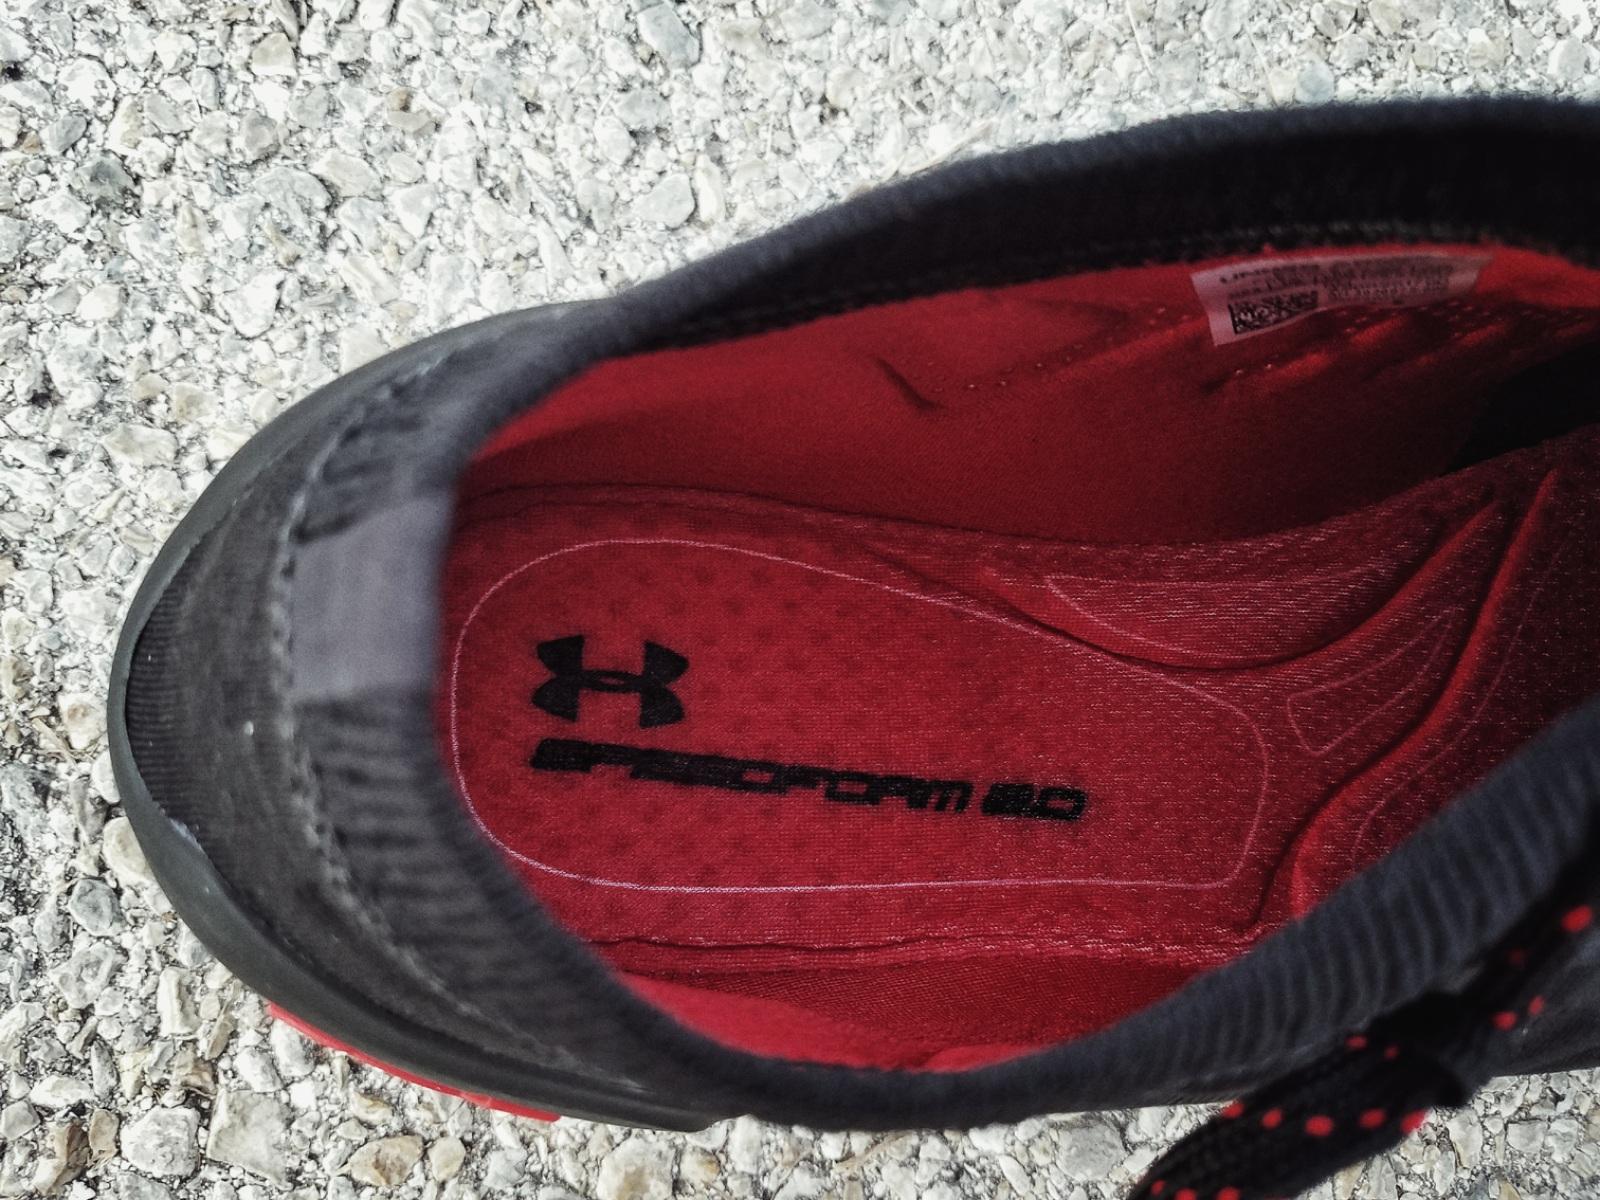 Sous Les Chaussures D'armure Hovr q7HjS